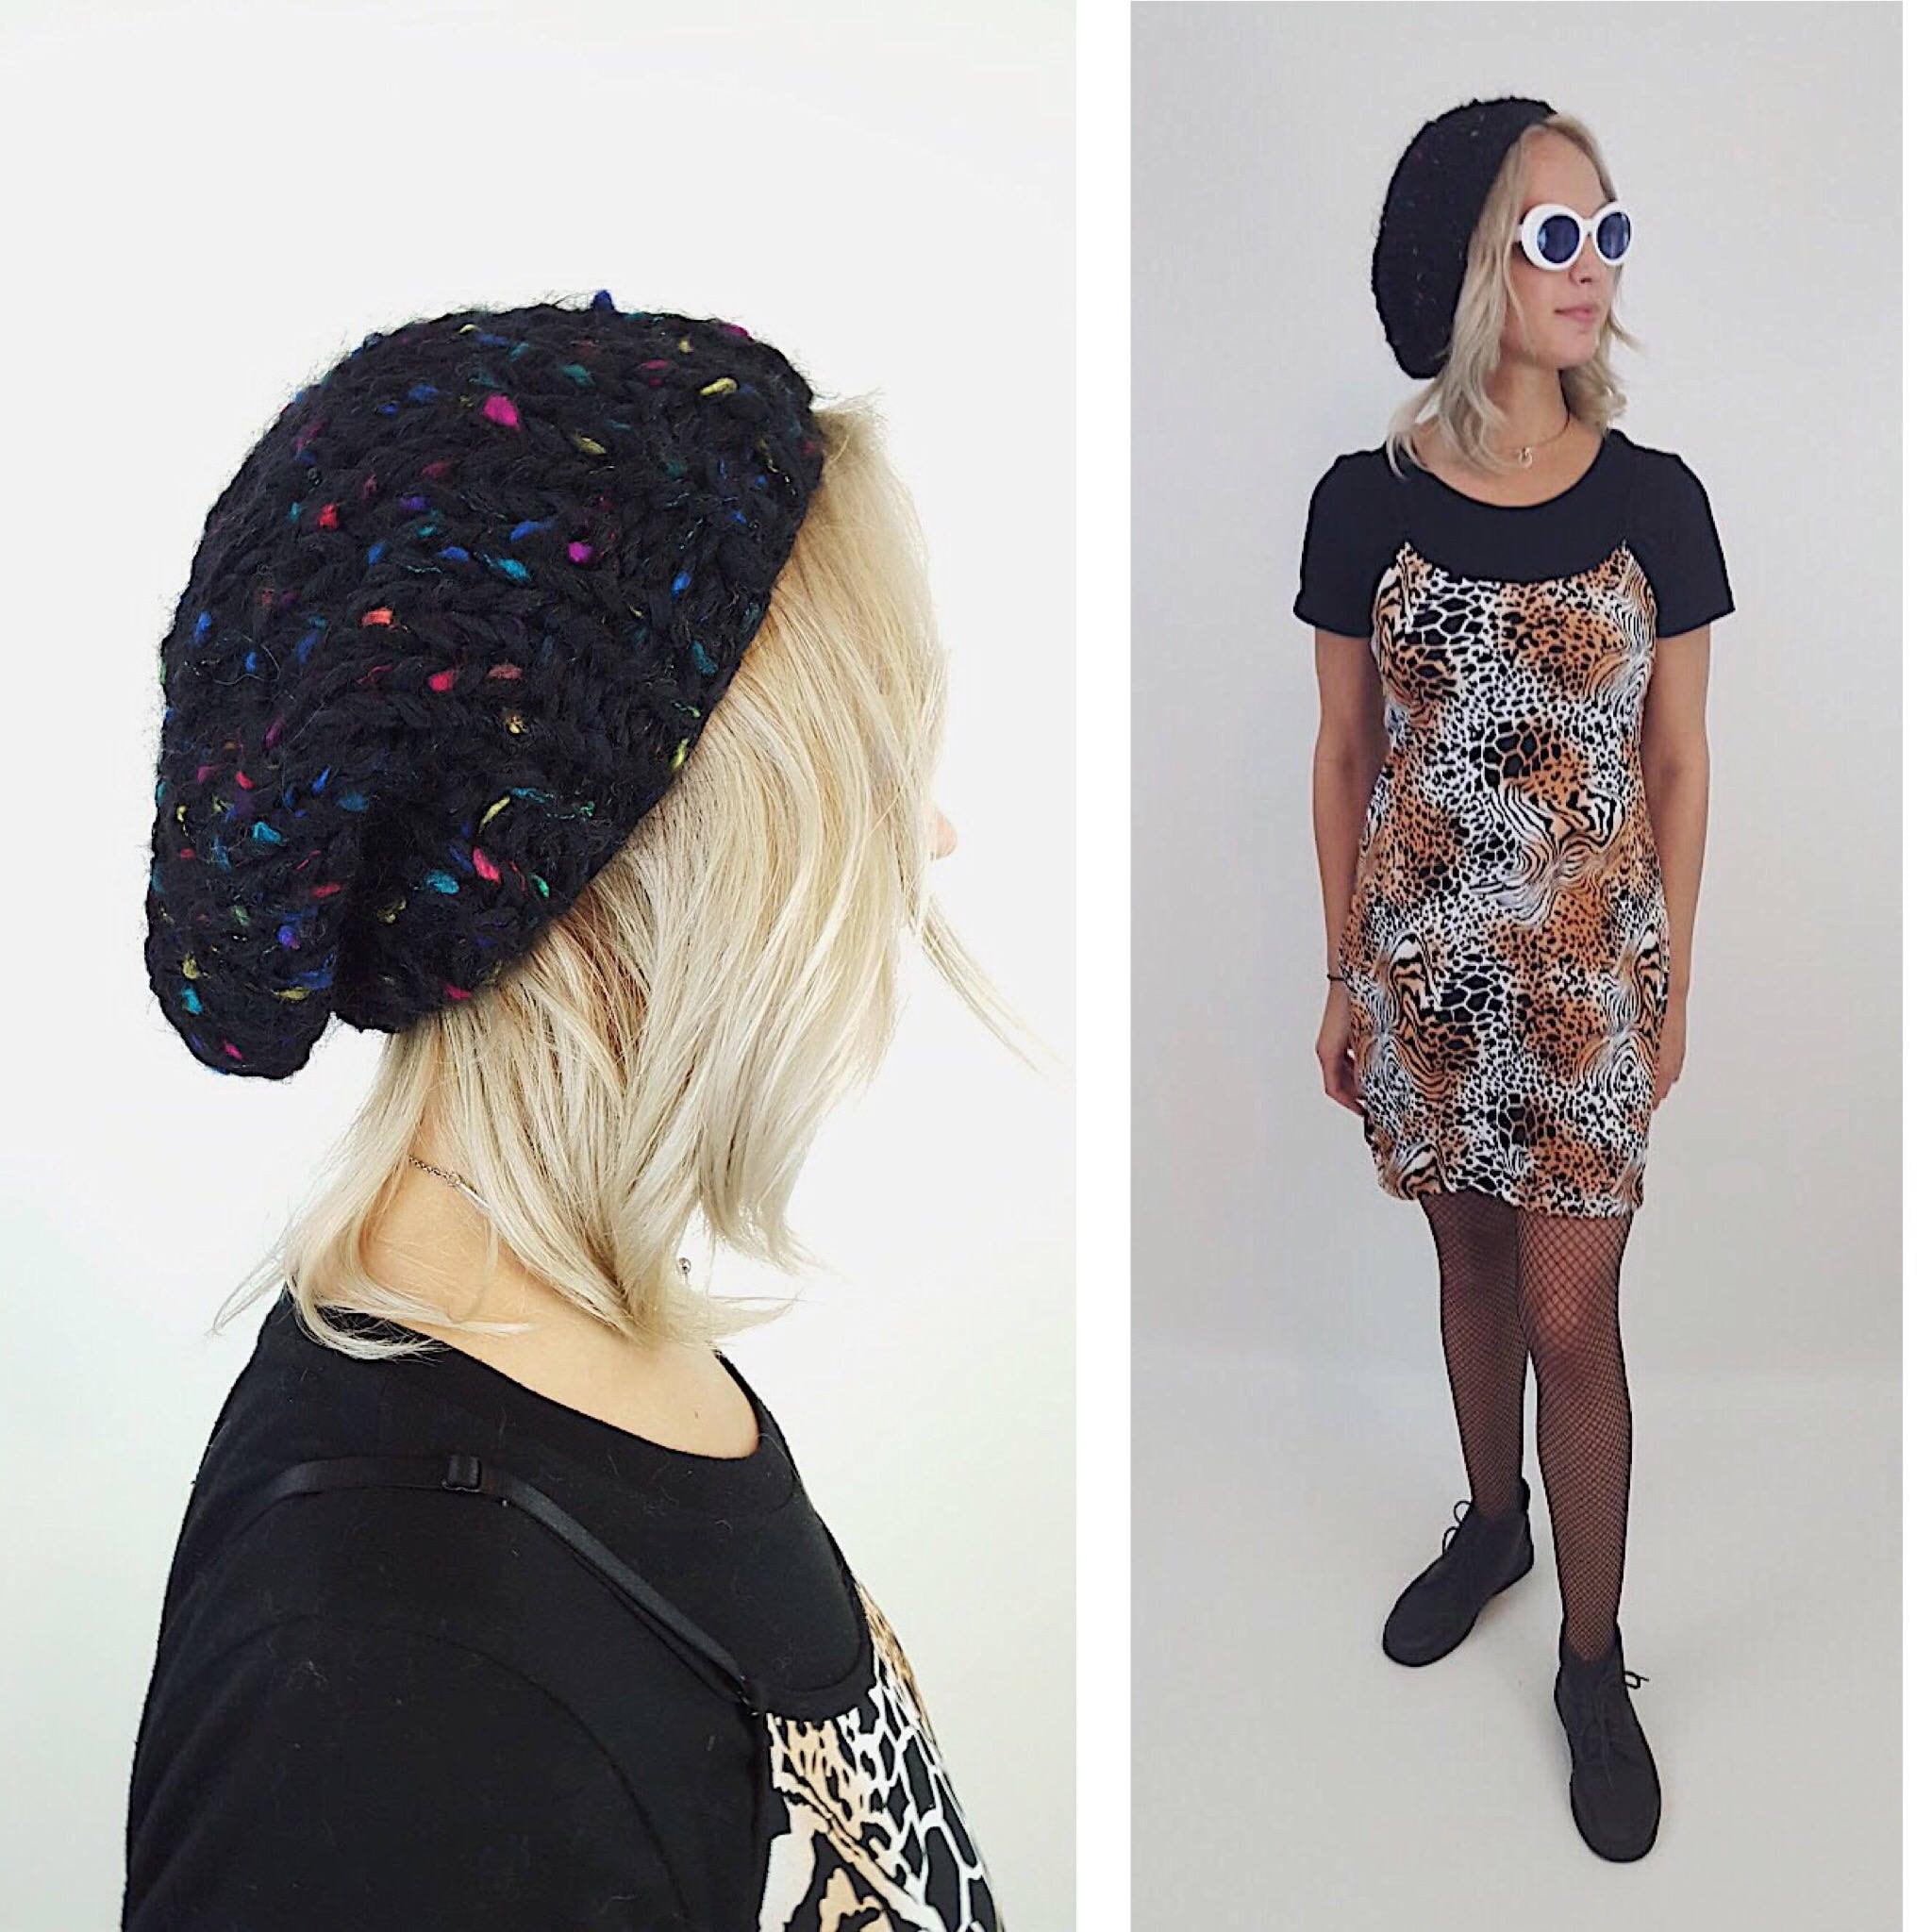 f1634cb1af97b Handknit Handmade Black Rainbow Slouchy Hat -Boho Hipster Fashion Style  Unique Womens Accessory - Soft Warm Winter Fall Upcycled Yarn Beanie.  gallery photo ...